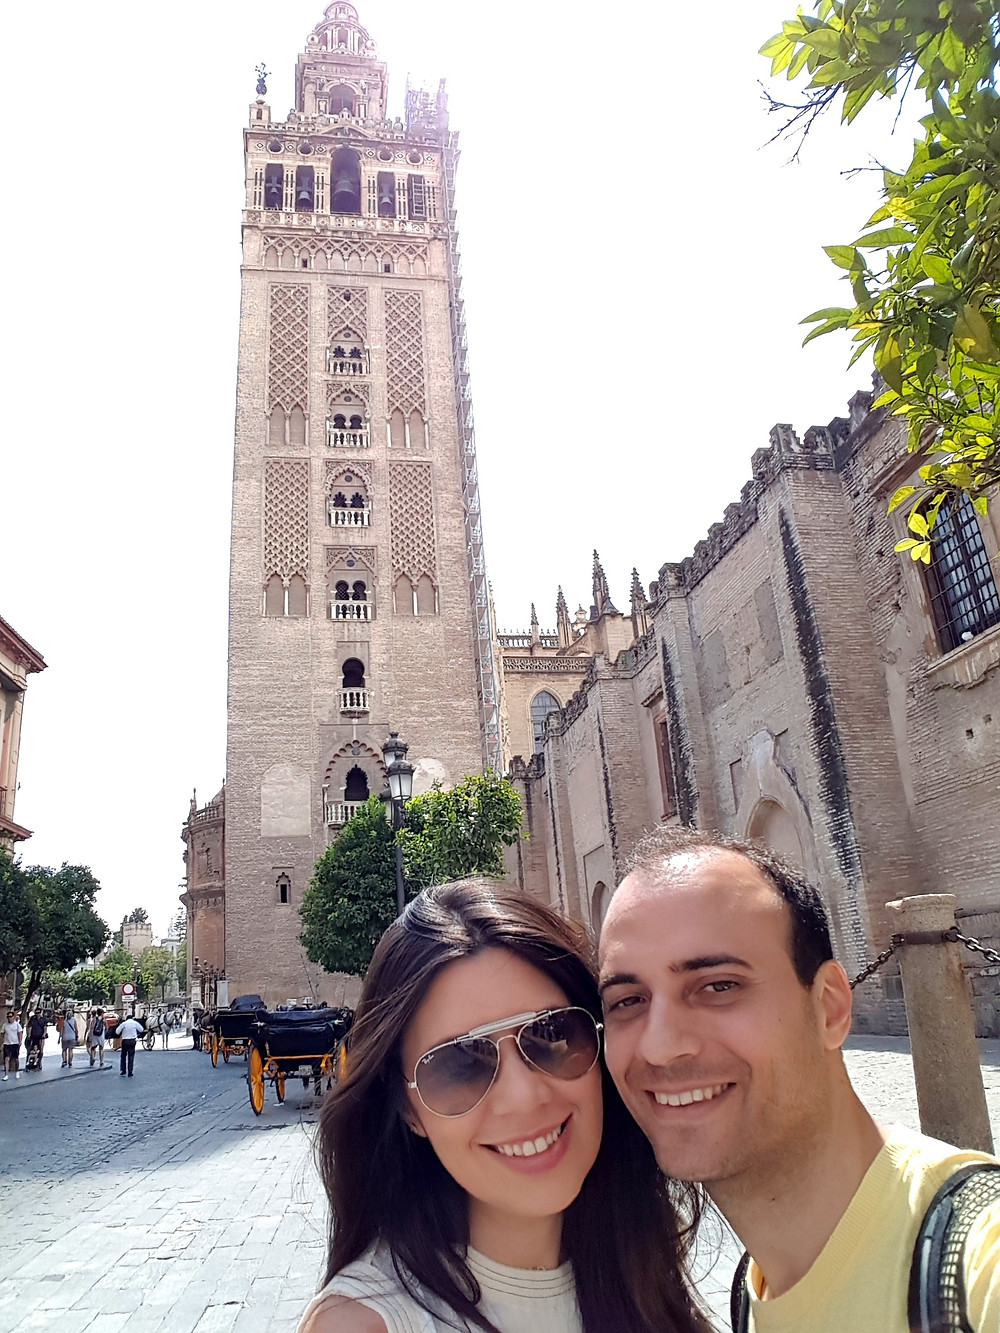 La Giralda - Catedral de Sevilha - Espanha